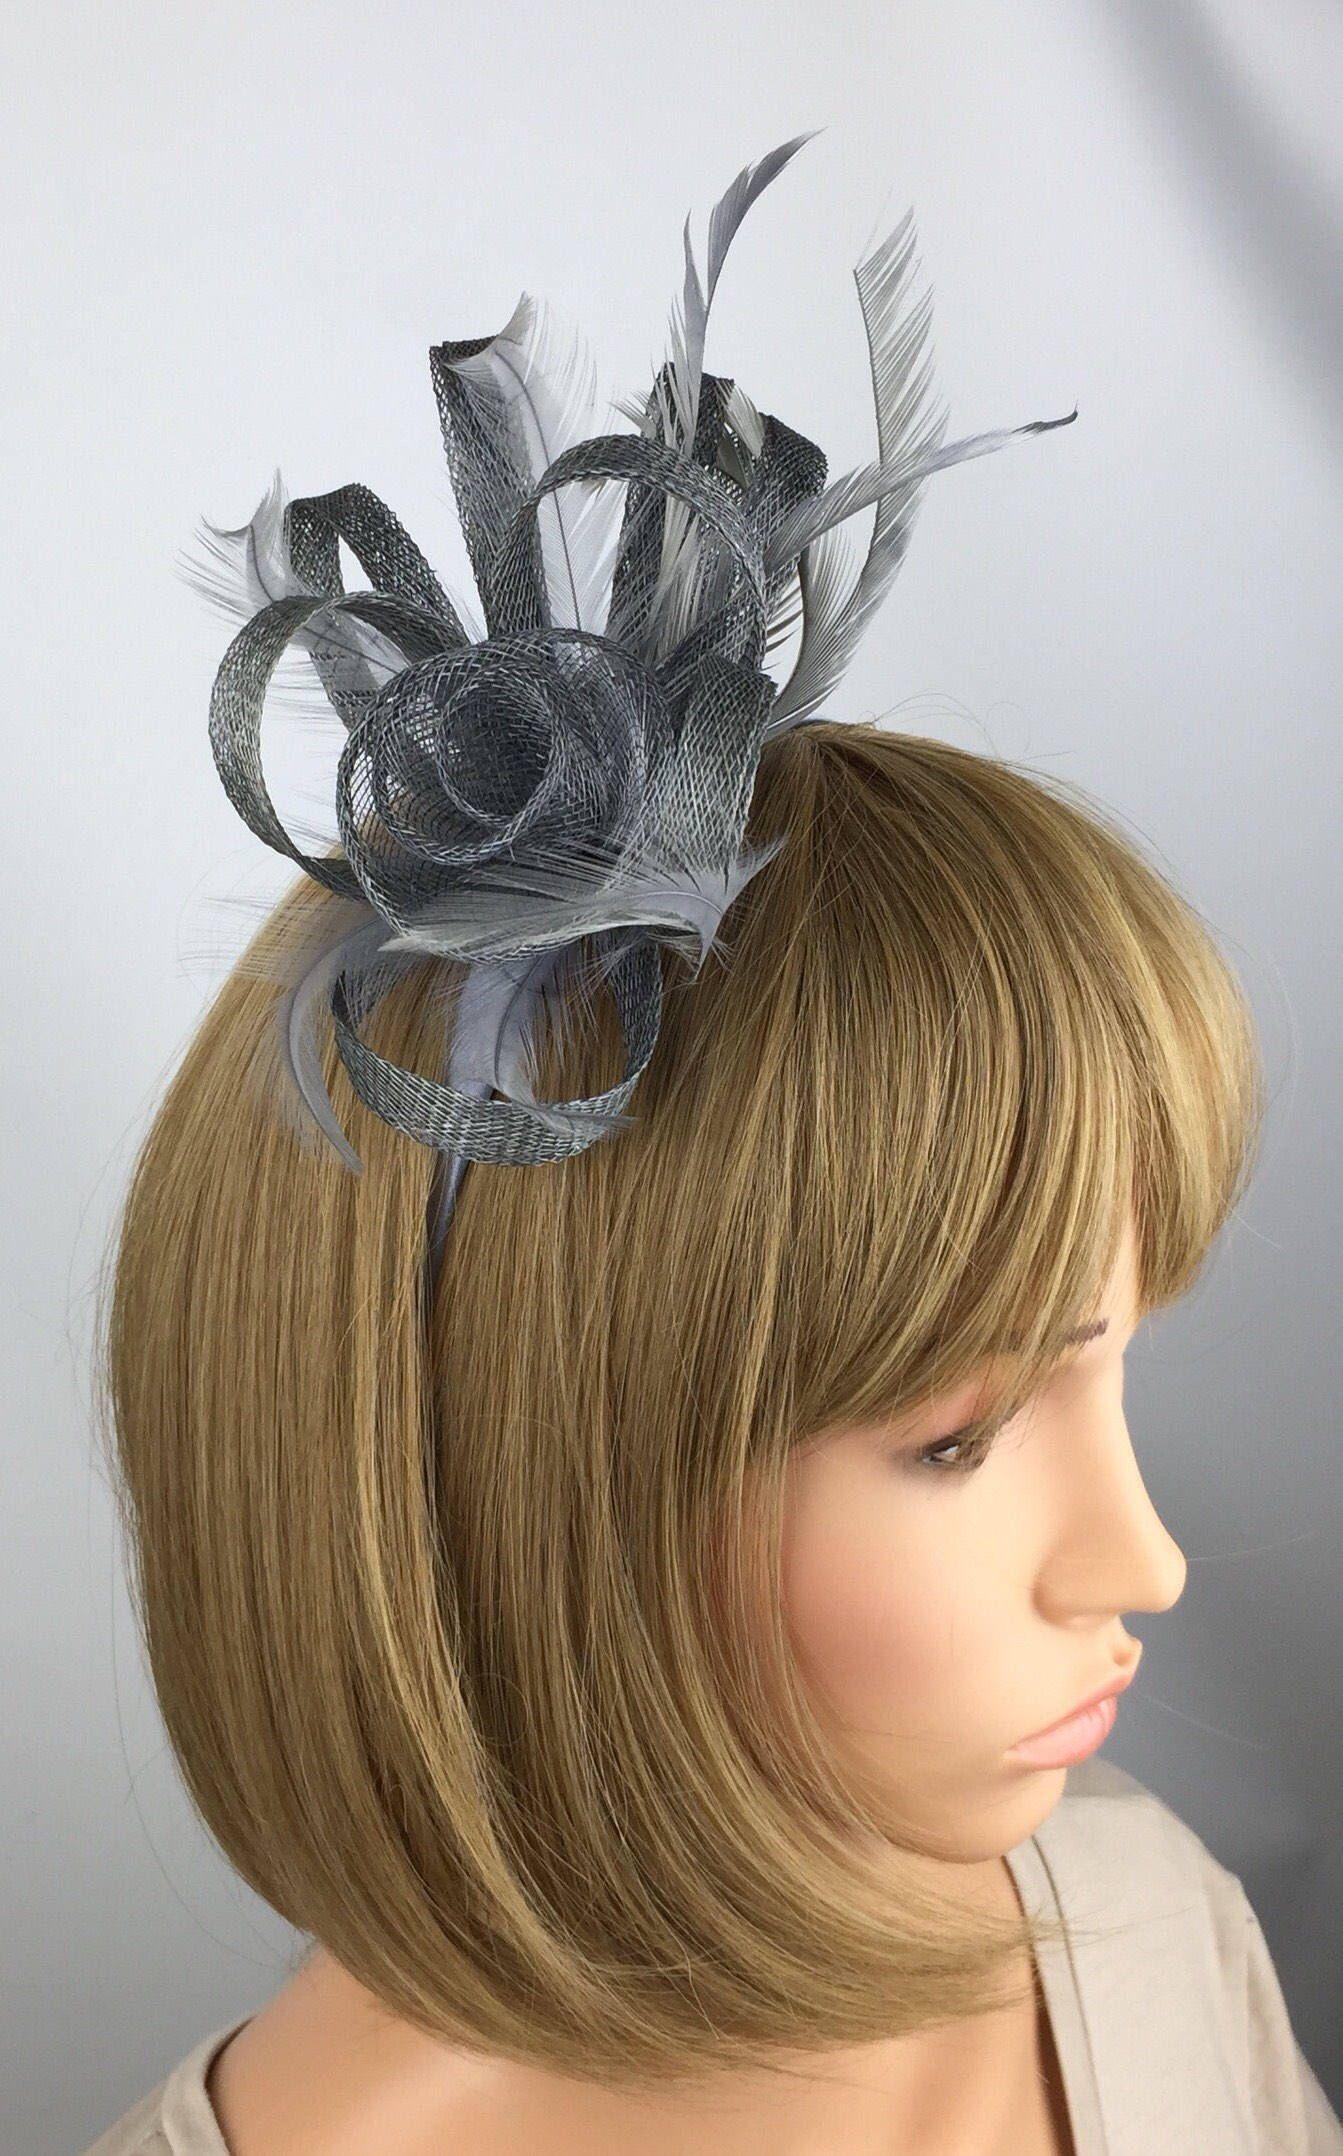 Silver Fascinator Grey Fascinator Gray Wedding Plantinium Pewter Hatinator Ascot Ladies Day Mother of the Bride Groom Occasion #fascinatorstyles